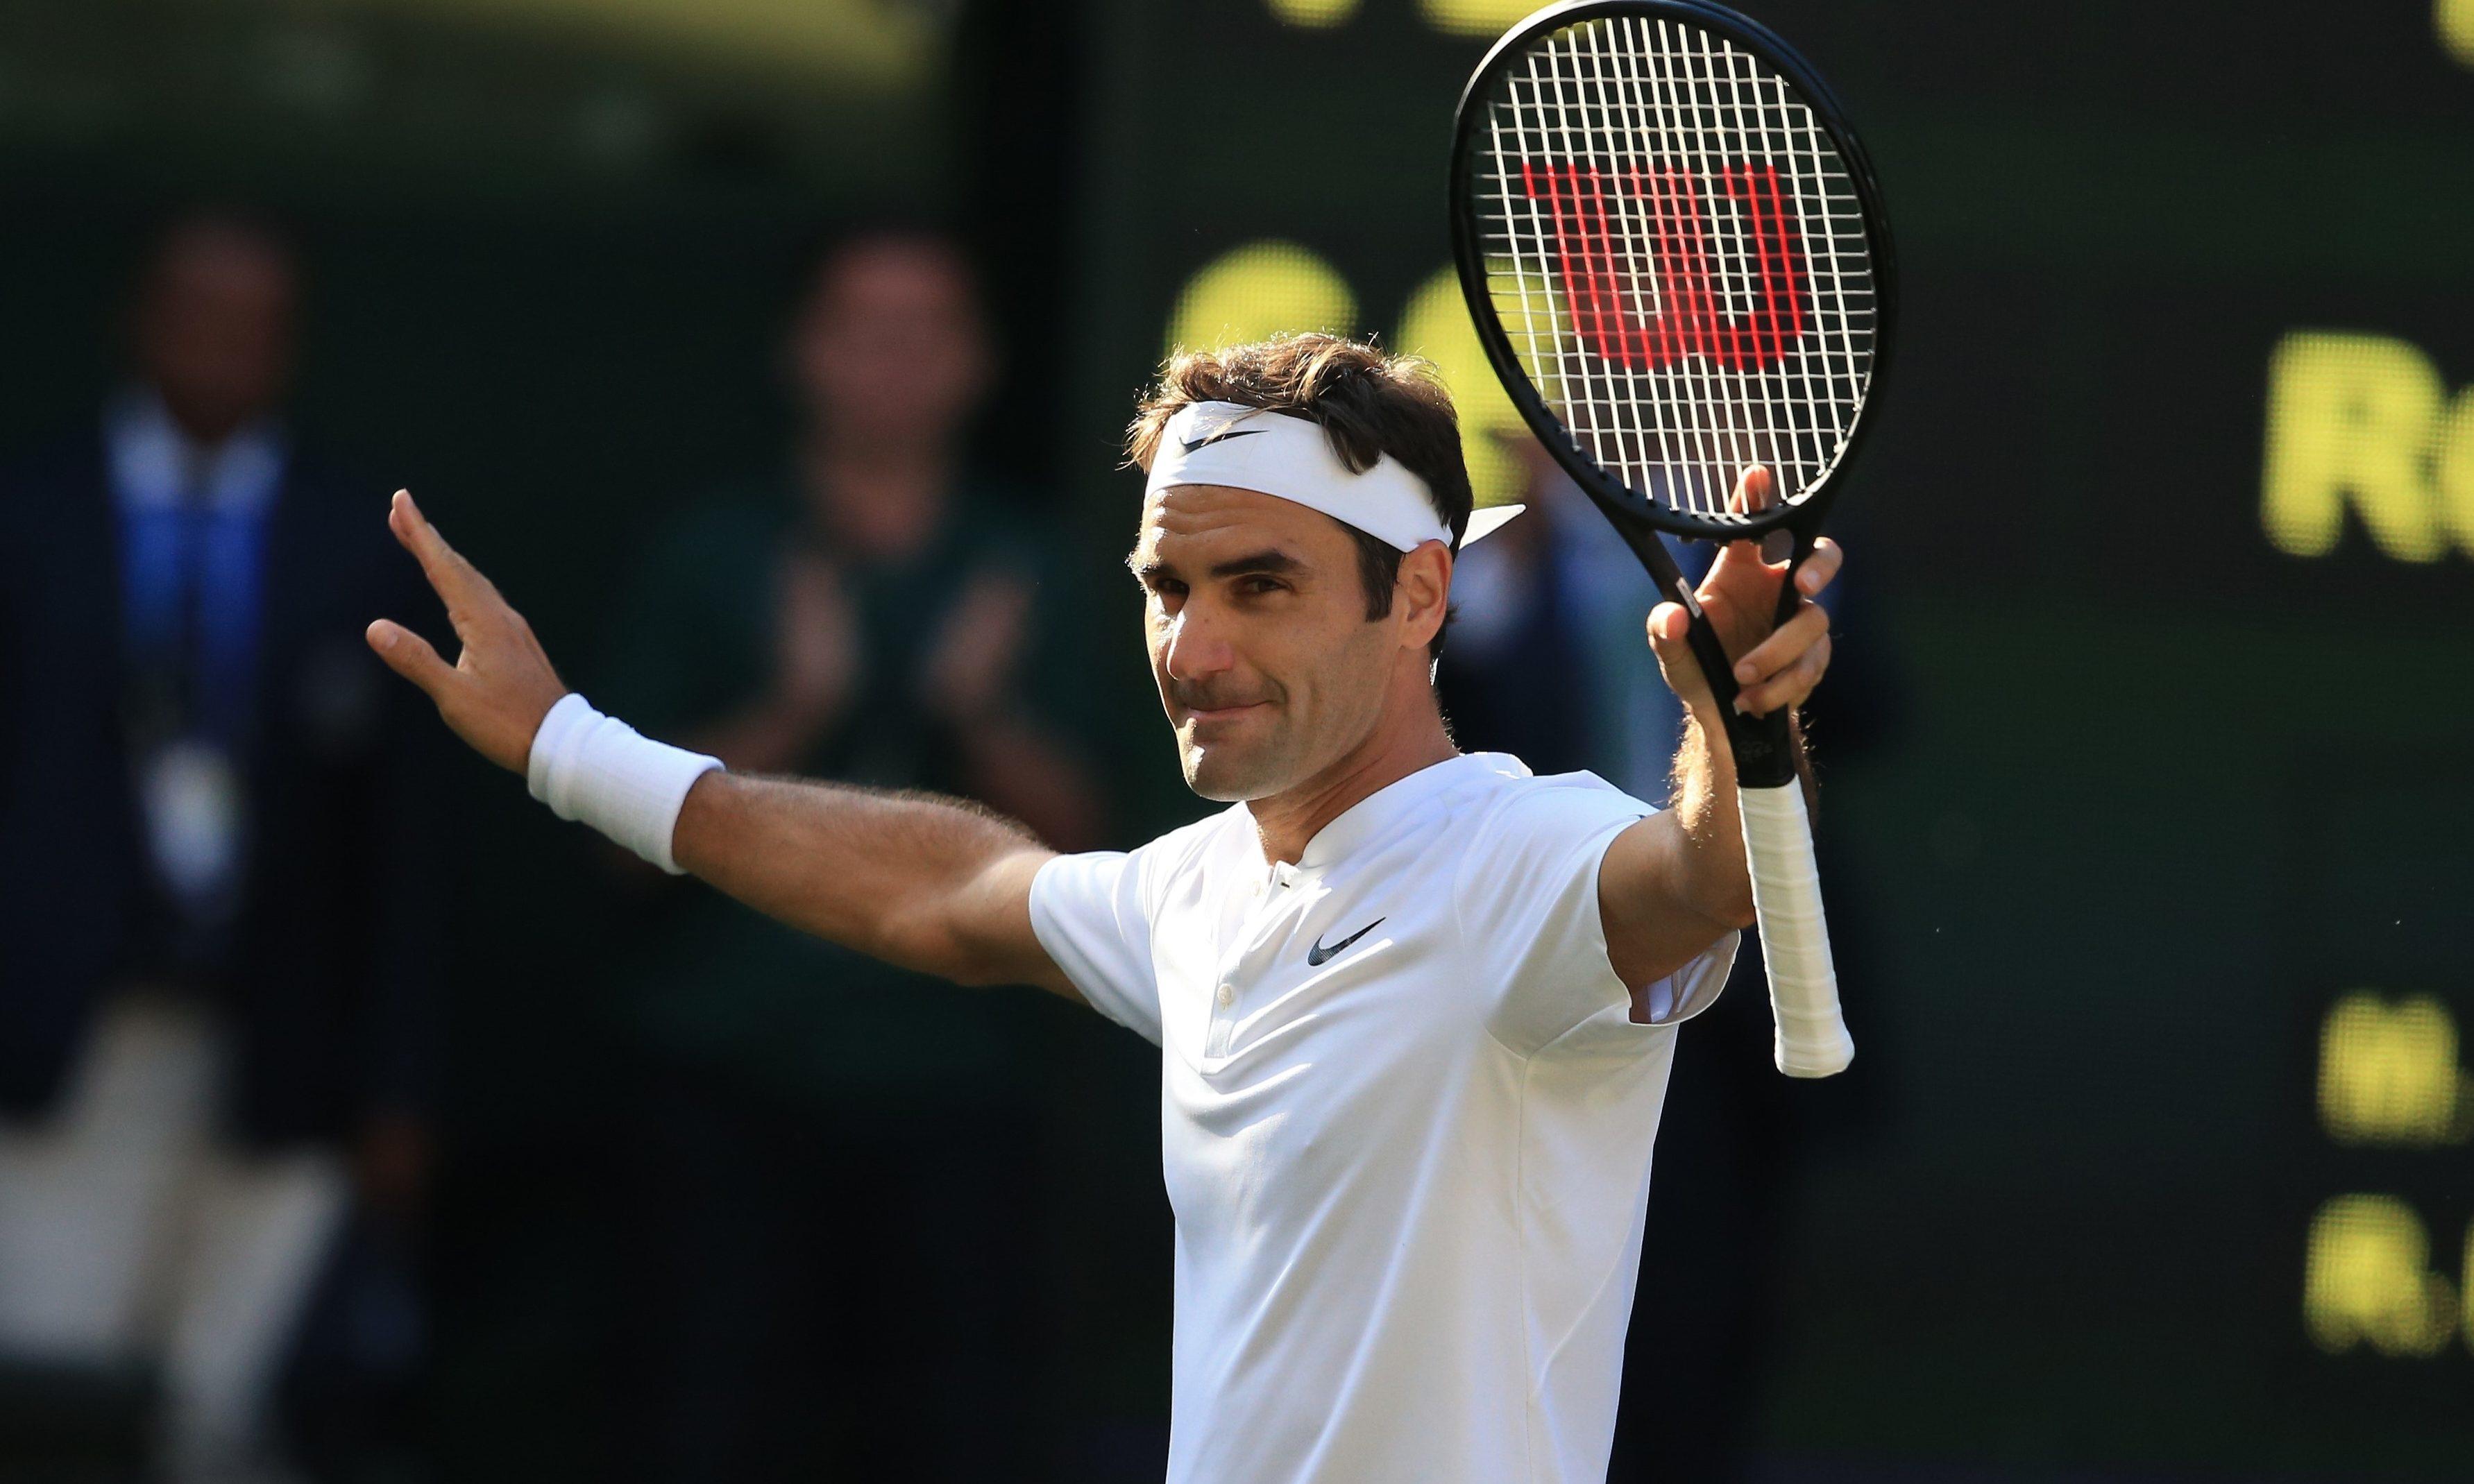 Roger Federer (Lindsey Parnaby/Anadolu Agency/Getty Images)